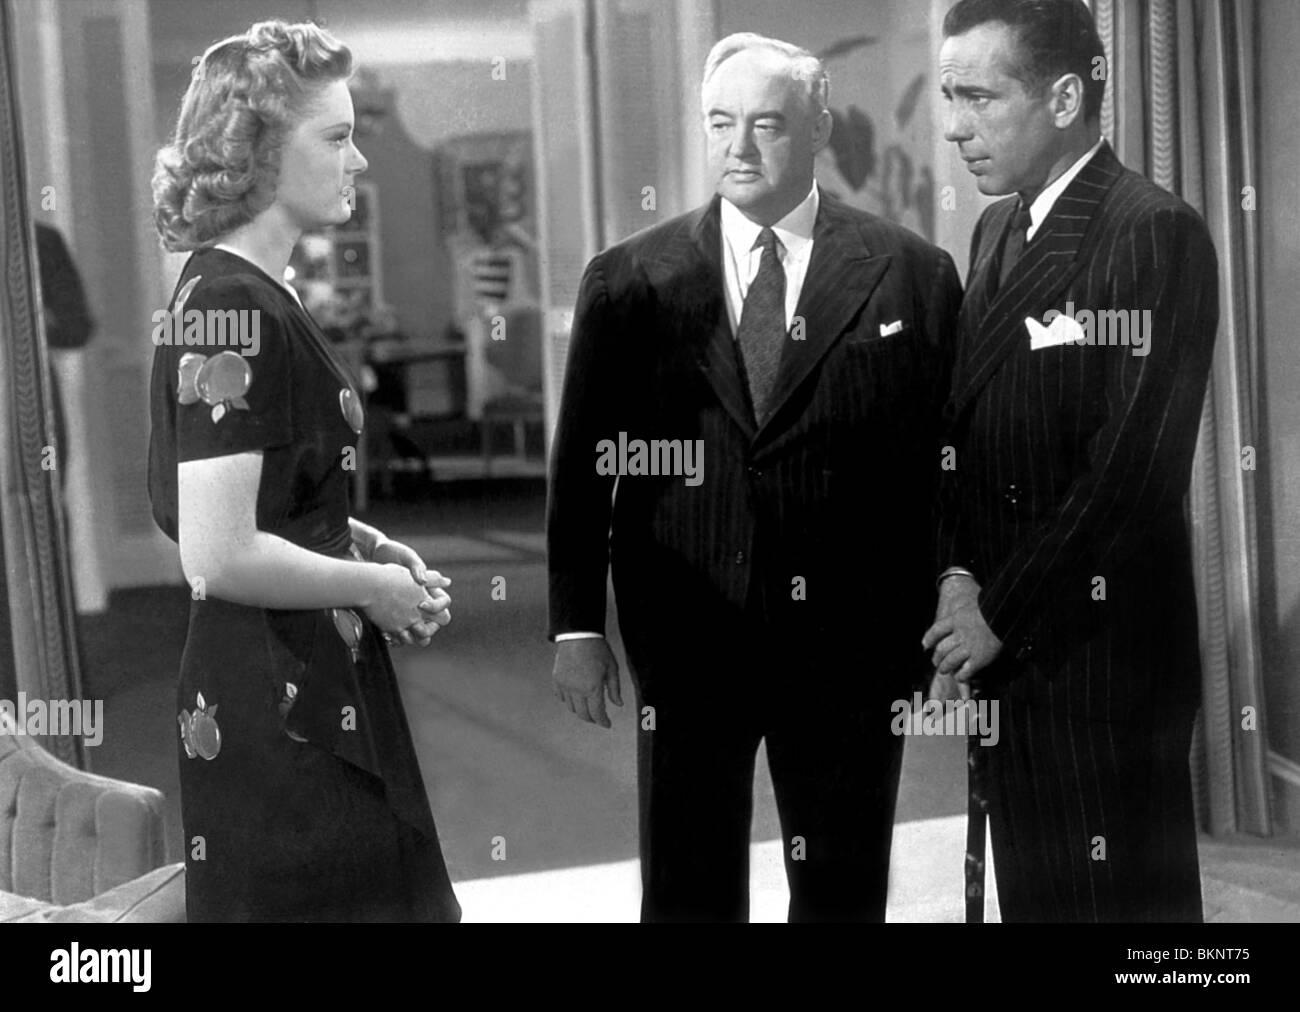 KONFLIKT (1945) HUMPHREY BOGART, SYDNEY GREENSTREET CFLT 001 Stockbild